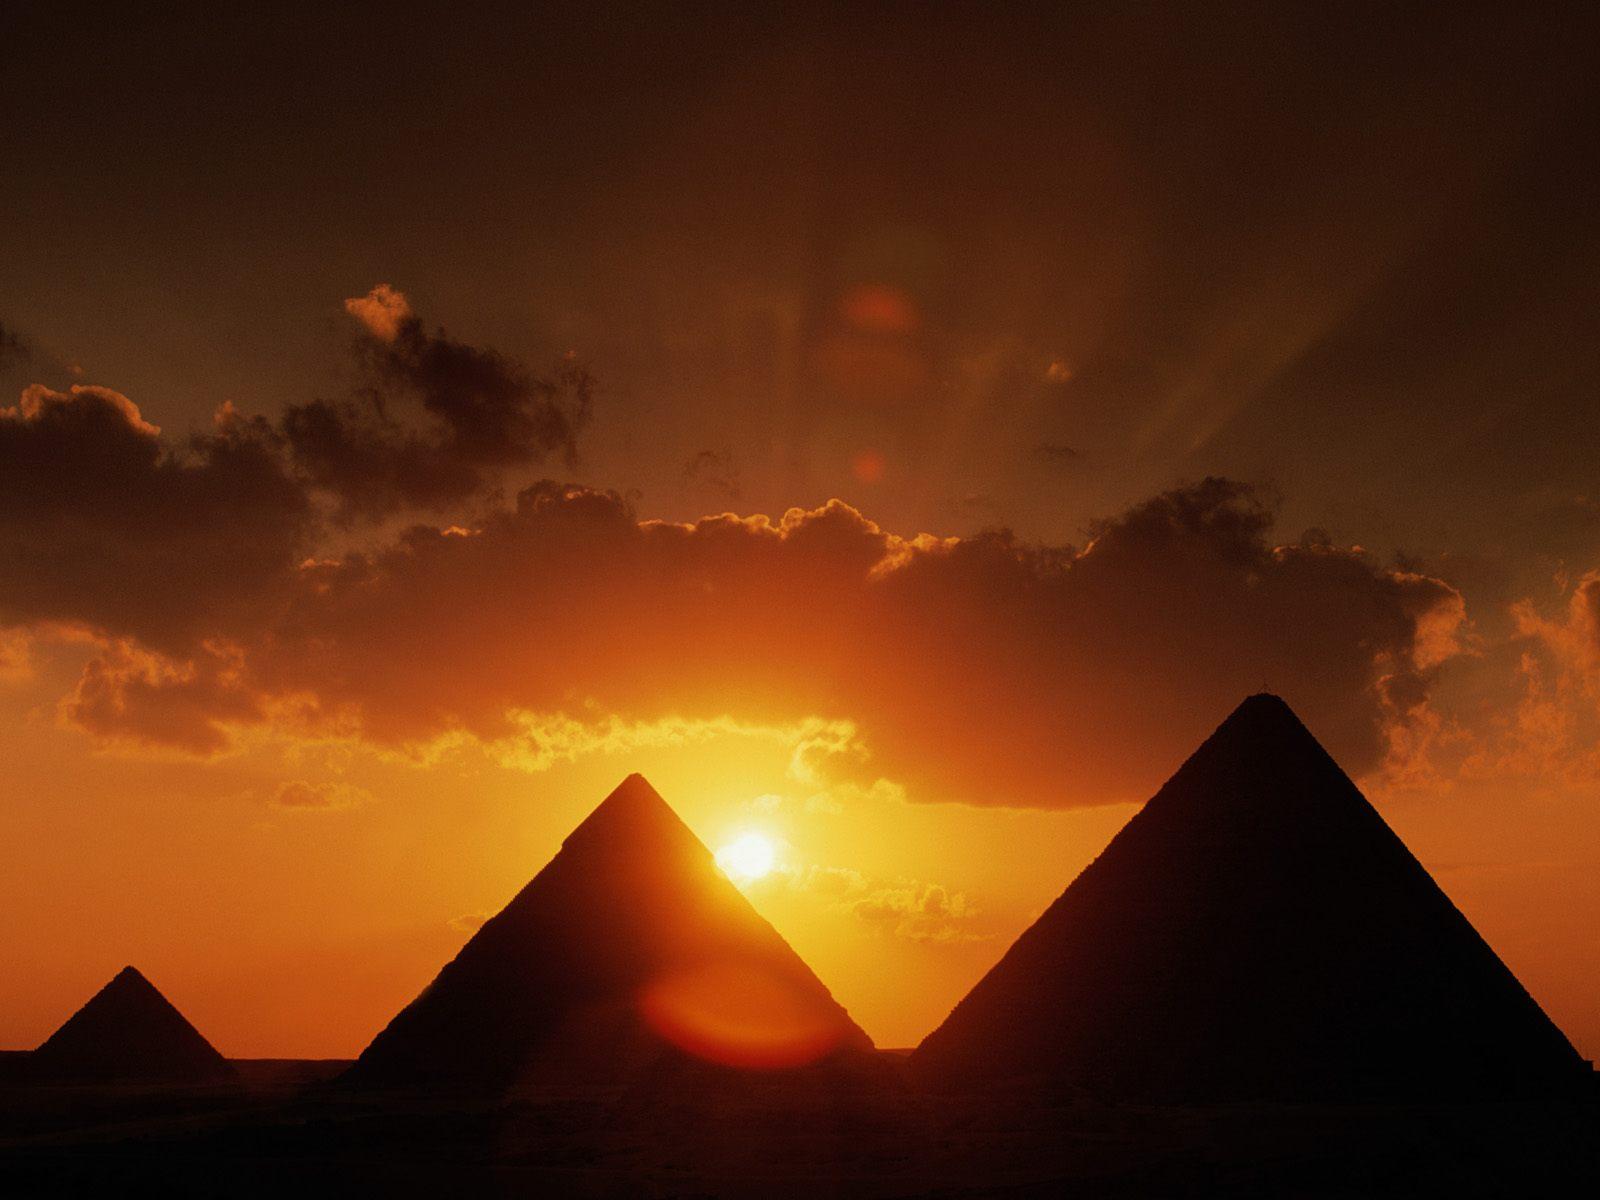 http://2.bp.blogspot.com/-ZBvQfxAGkFY/TvRd8EzCA1I/AAAAAAAACQU/81L5d1Roeec/s1600/egypt+%252813%2529.jpg